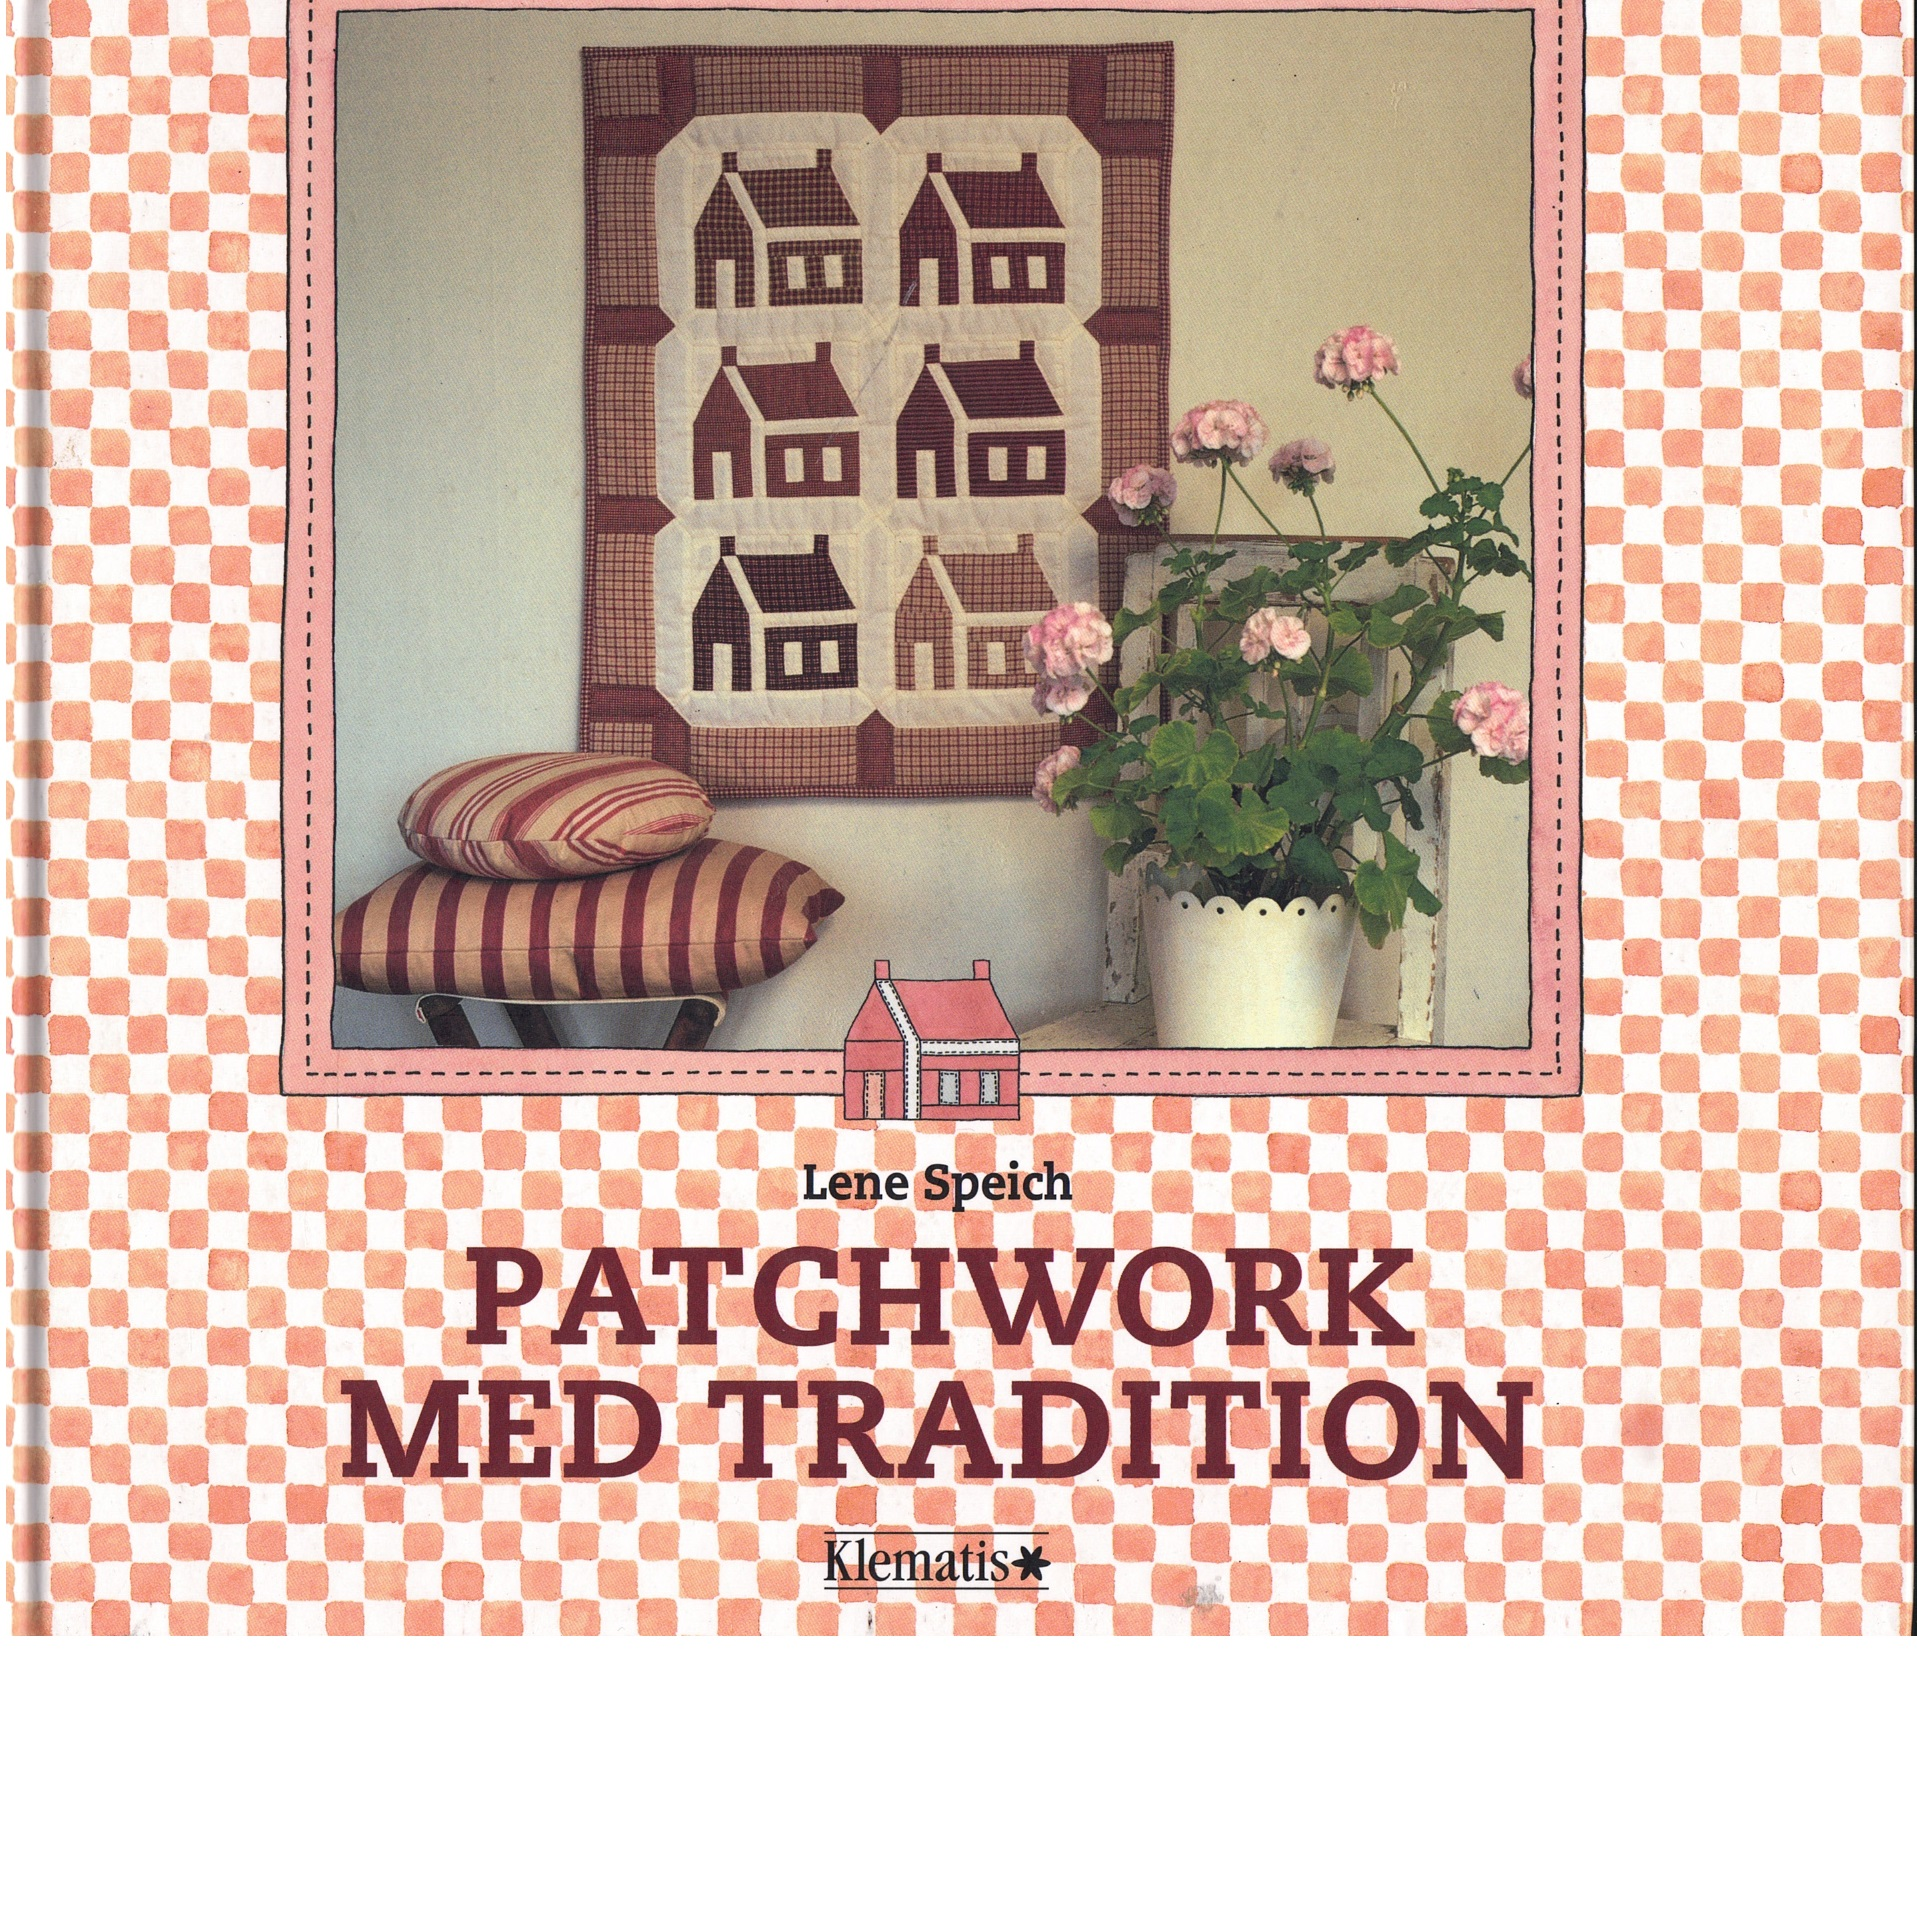 Patchwork med tradition - Speich, Lene